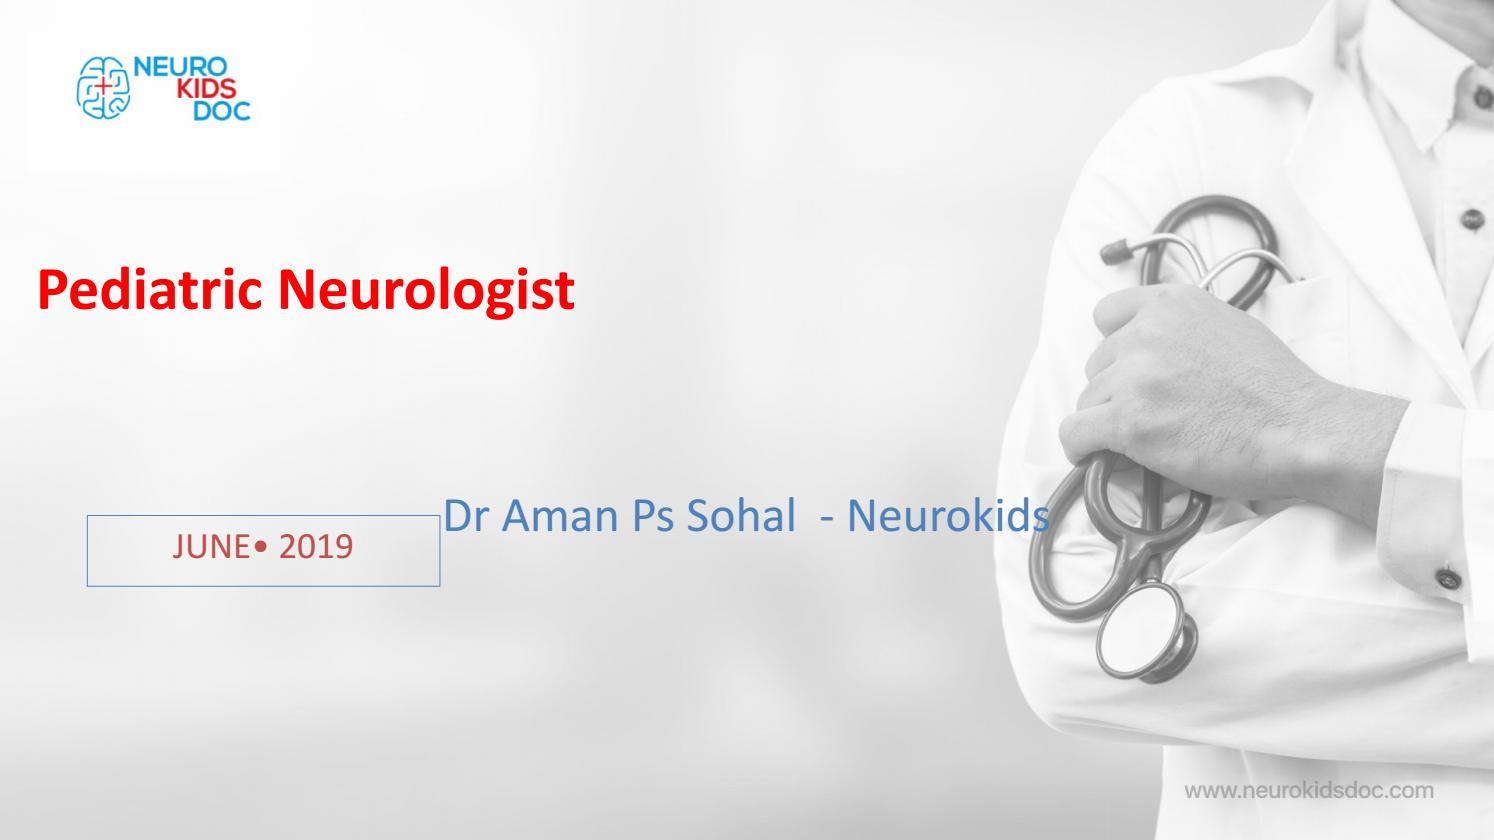 Pediatric Neurologist Dubai | NeurokidsDoc by neurokidsdoc - issuu